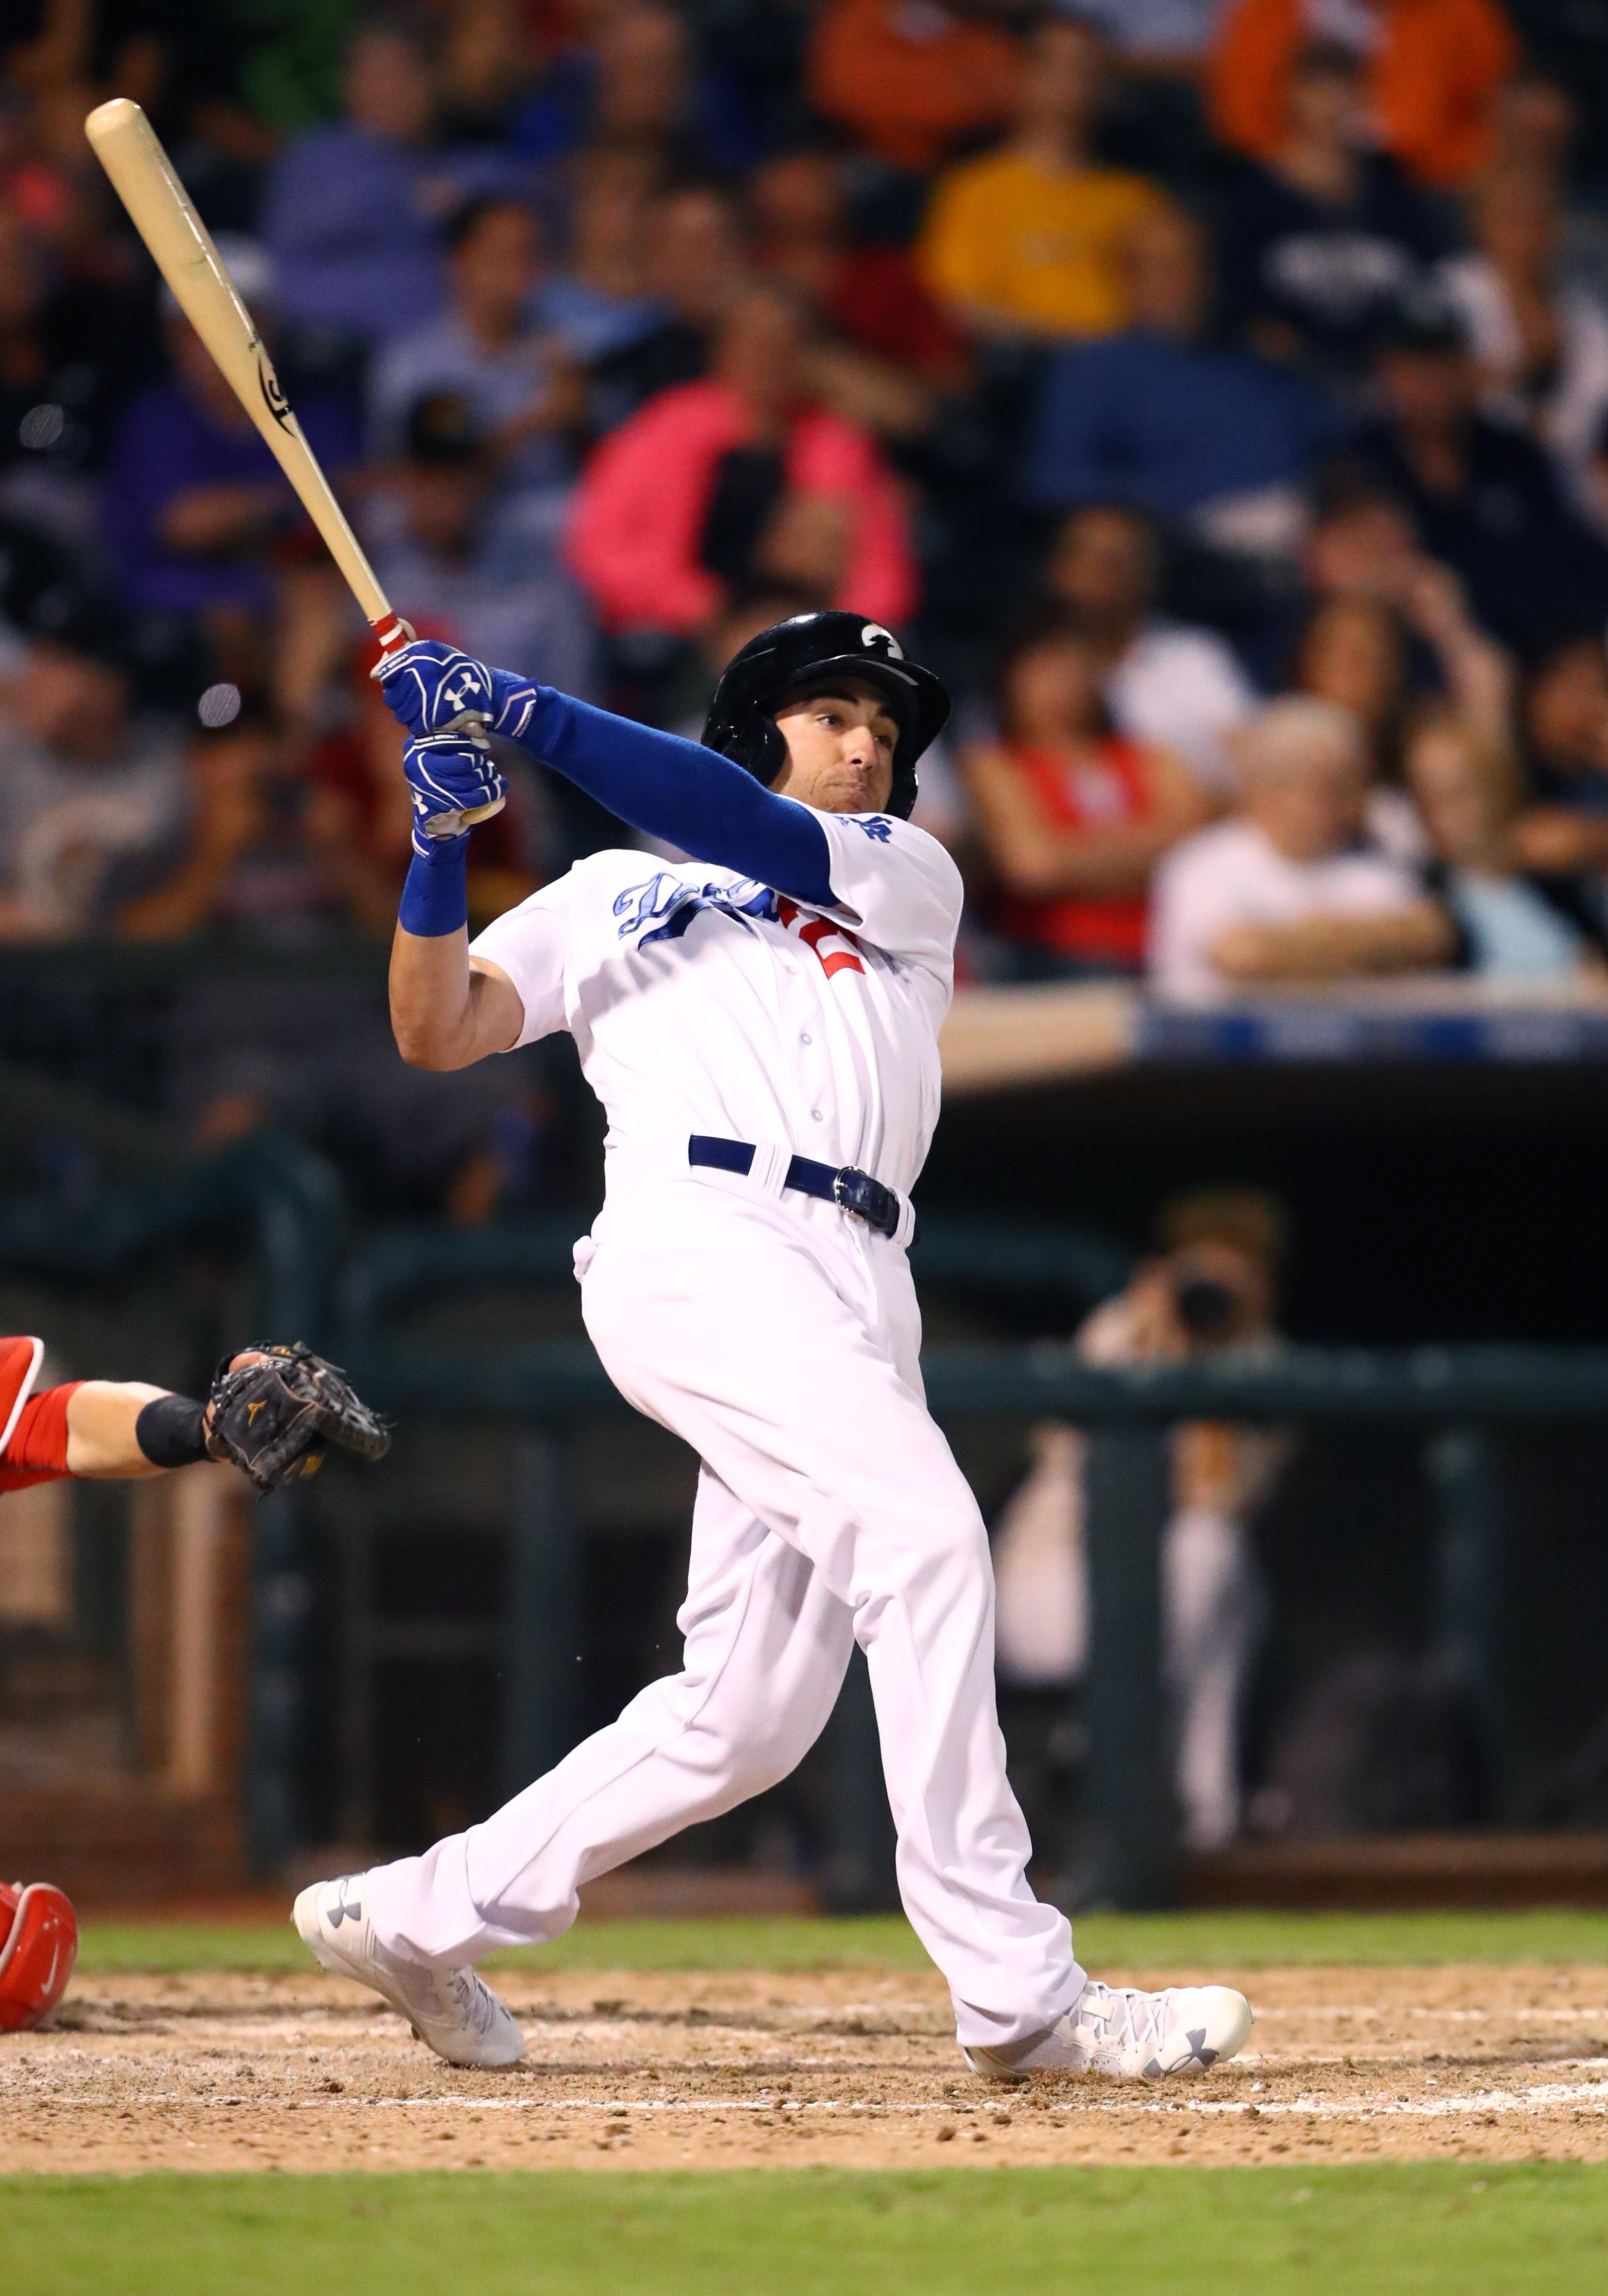 Minor League Baseball: Arizona Fall League-Fall Stars Game